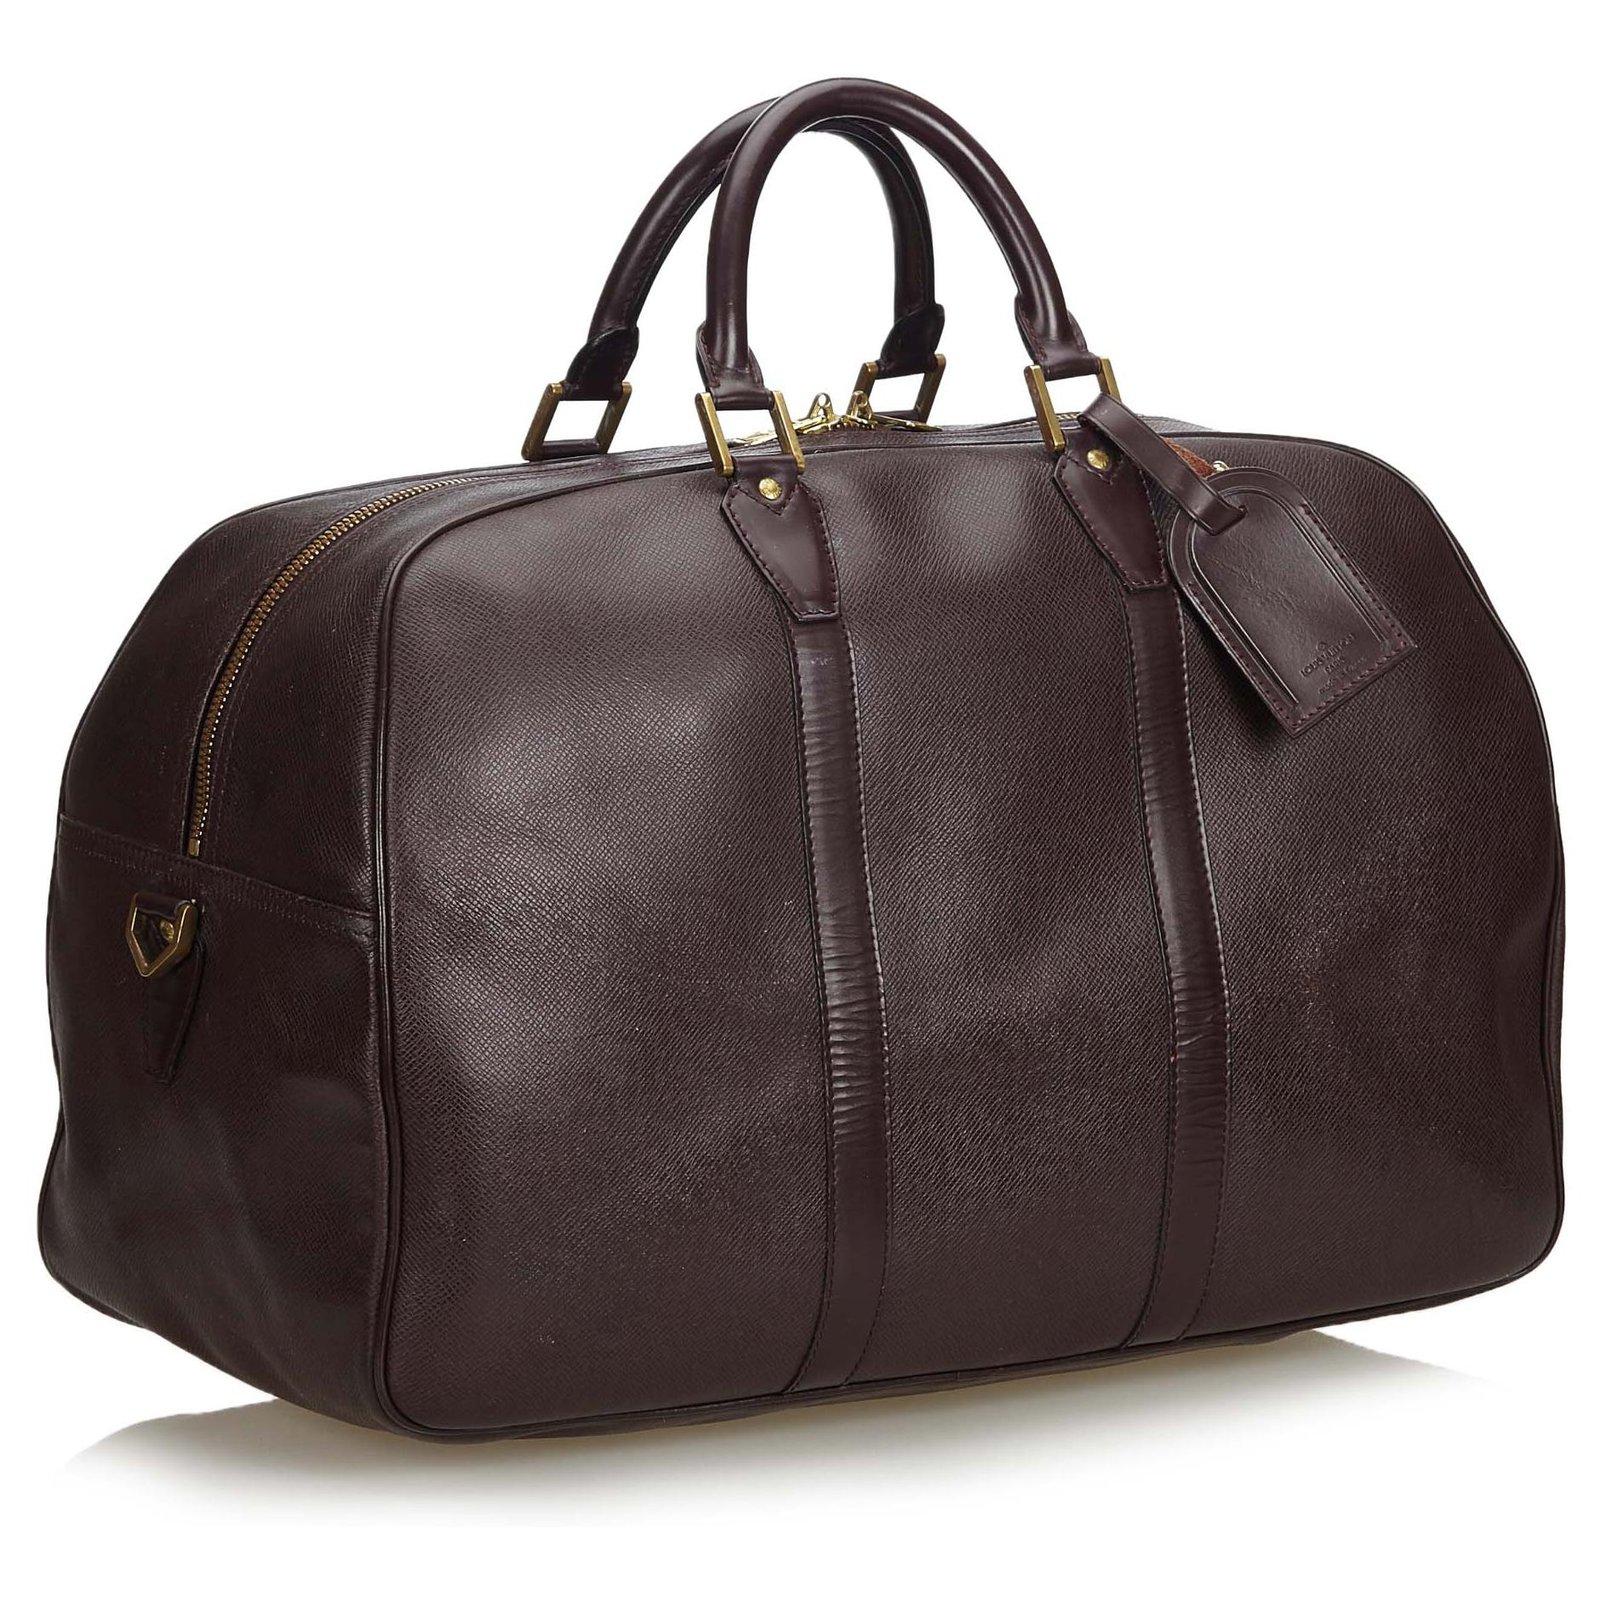 1ce47d6bebcad Louis Vuitton Louis Vuitton Roter Taiga Kendall GM Reisetasche Leder ...